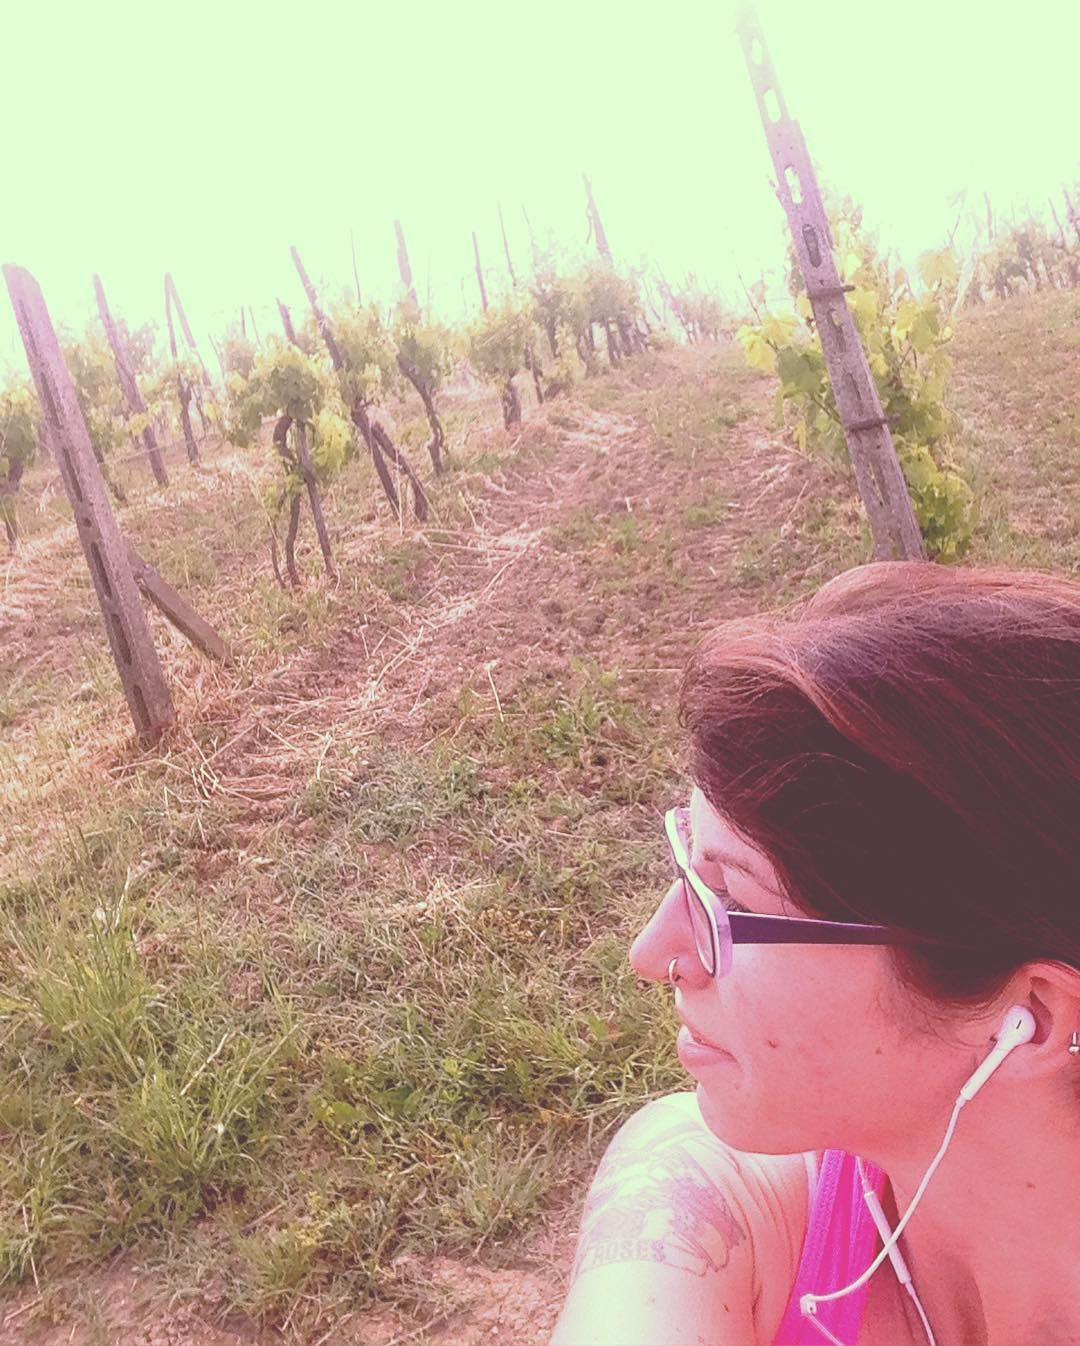 Oggi corsetta su e giù tra nebbia e vigneti. #corsa #running #run #vigne #vigneti #nebbia #fog #wine #tuscany #collinesenesi #siena #colline #suegiù #chefatica #altrochesquat #corsetta #fitness #wellness #beautifulplace #restoqui #selfie by beafransje